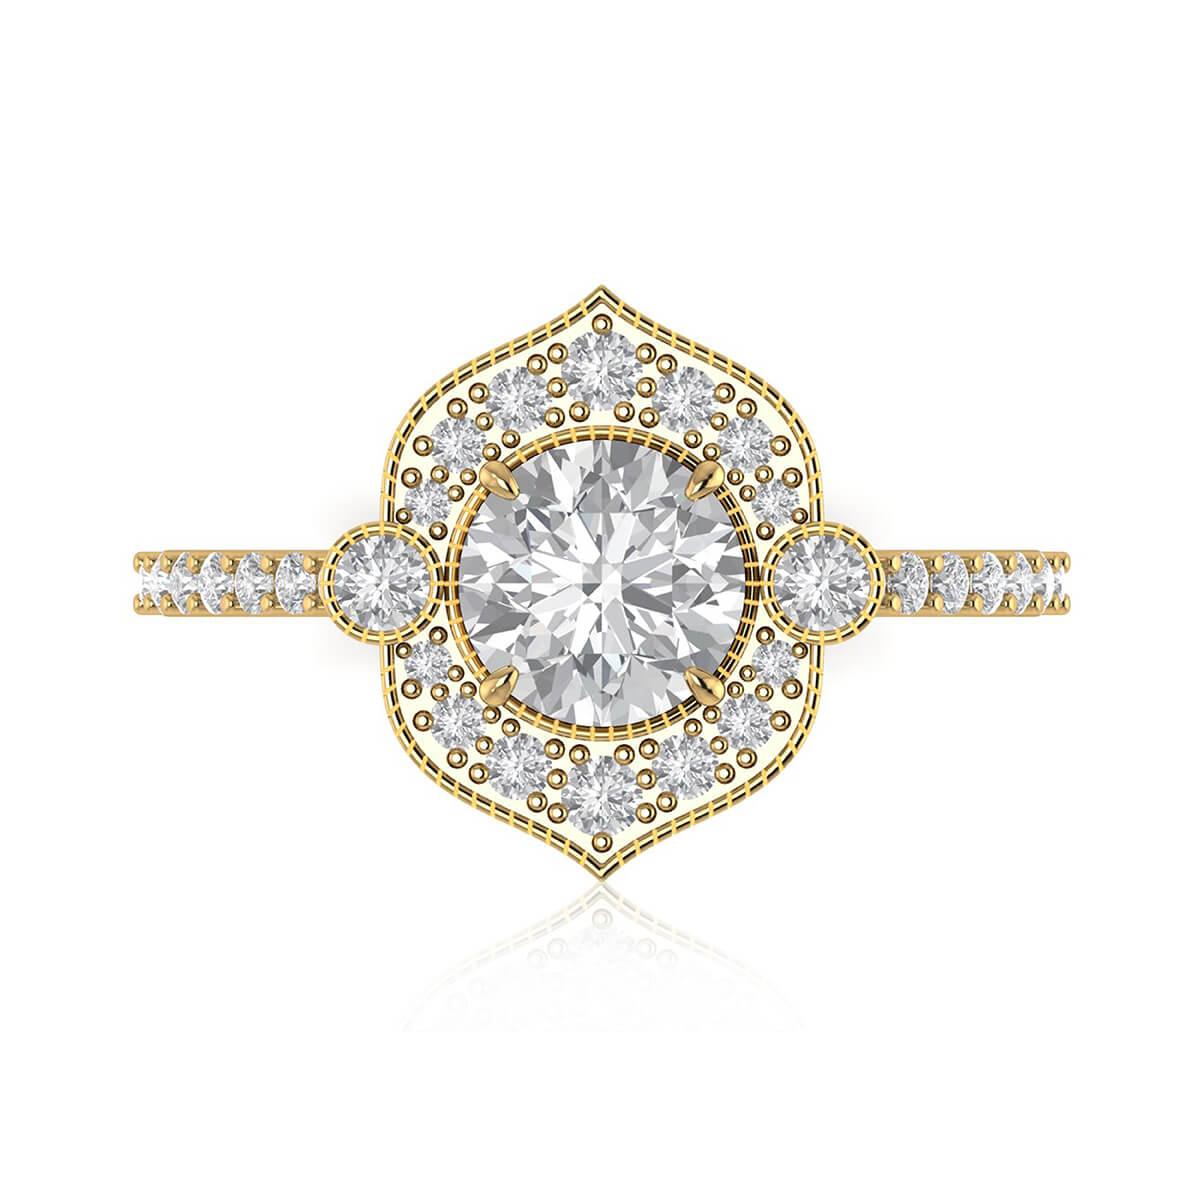 The Power of Love Diamond Ring